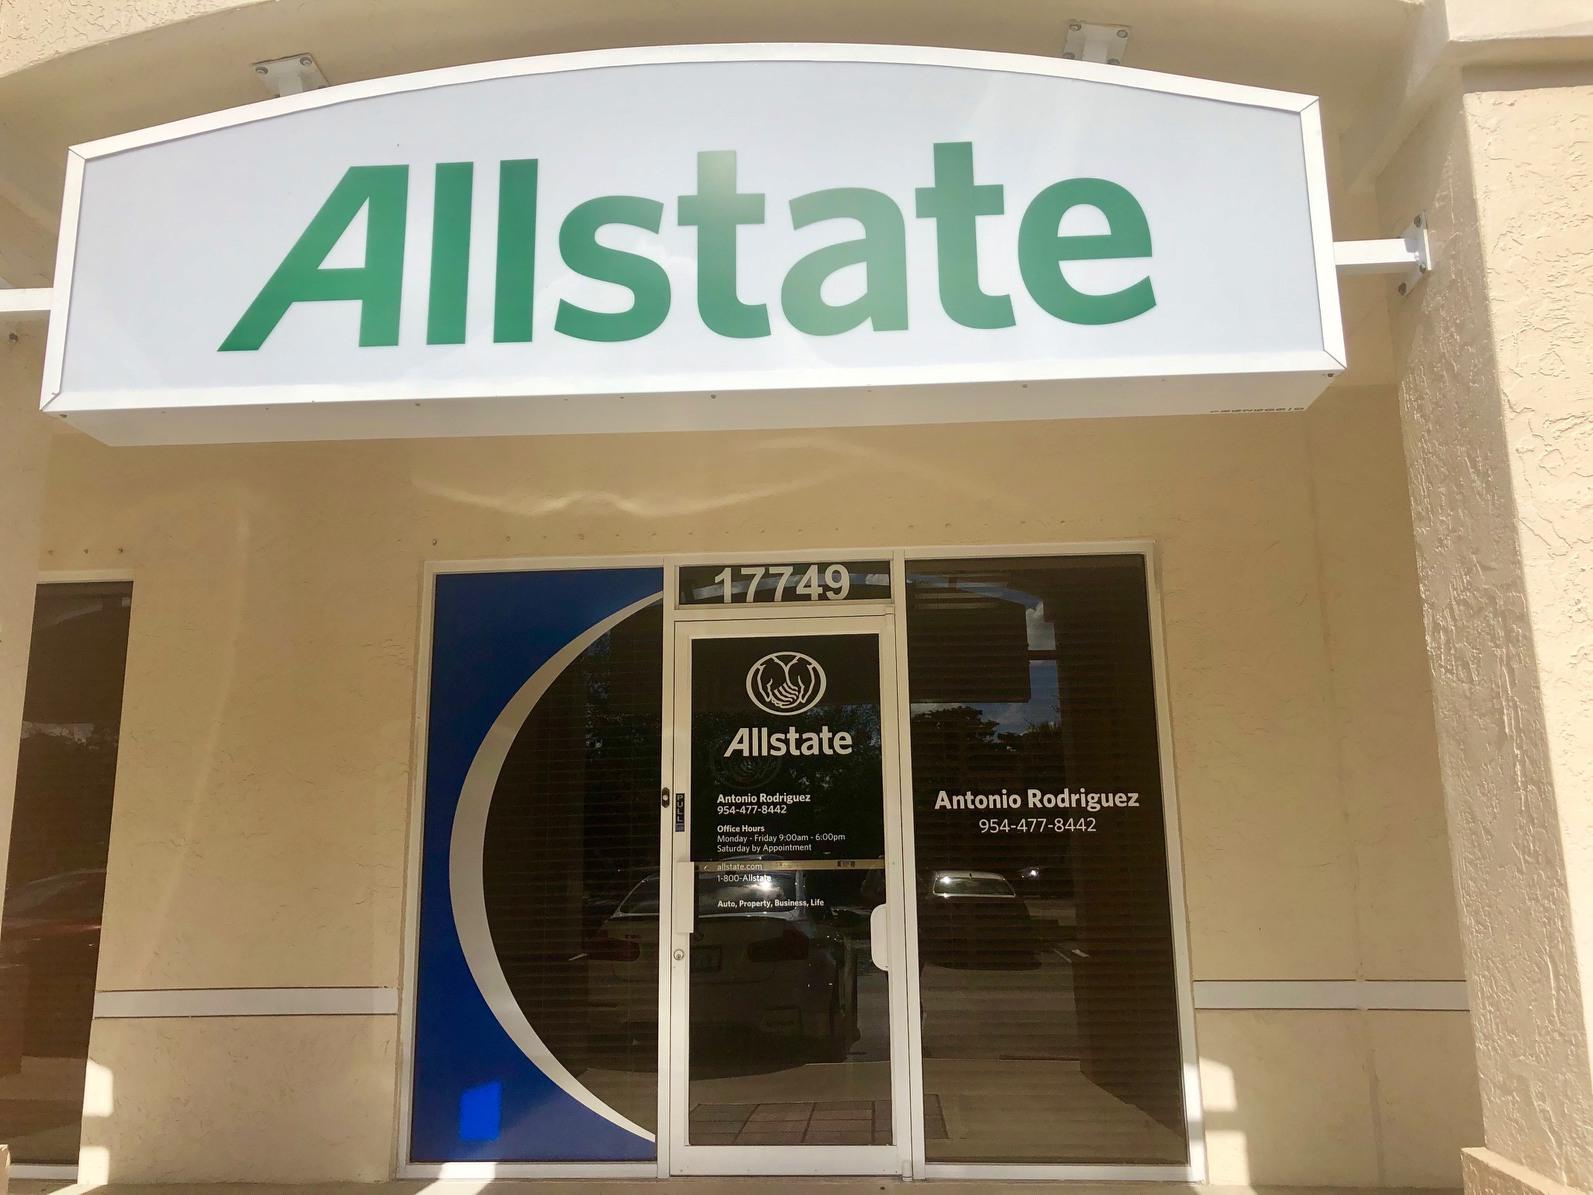 Antonio Rodriguez: Allstate Insurance image 1